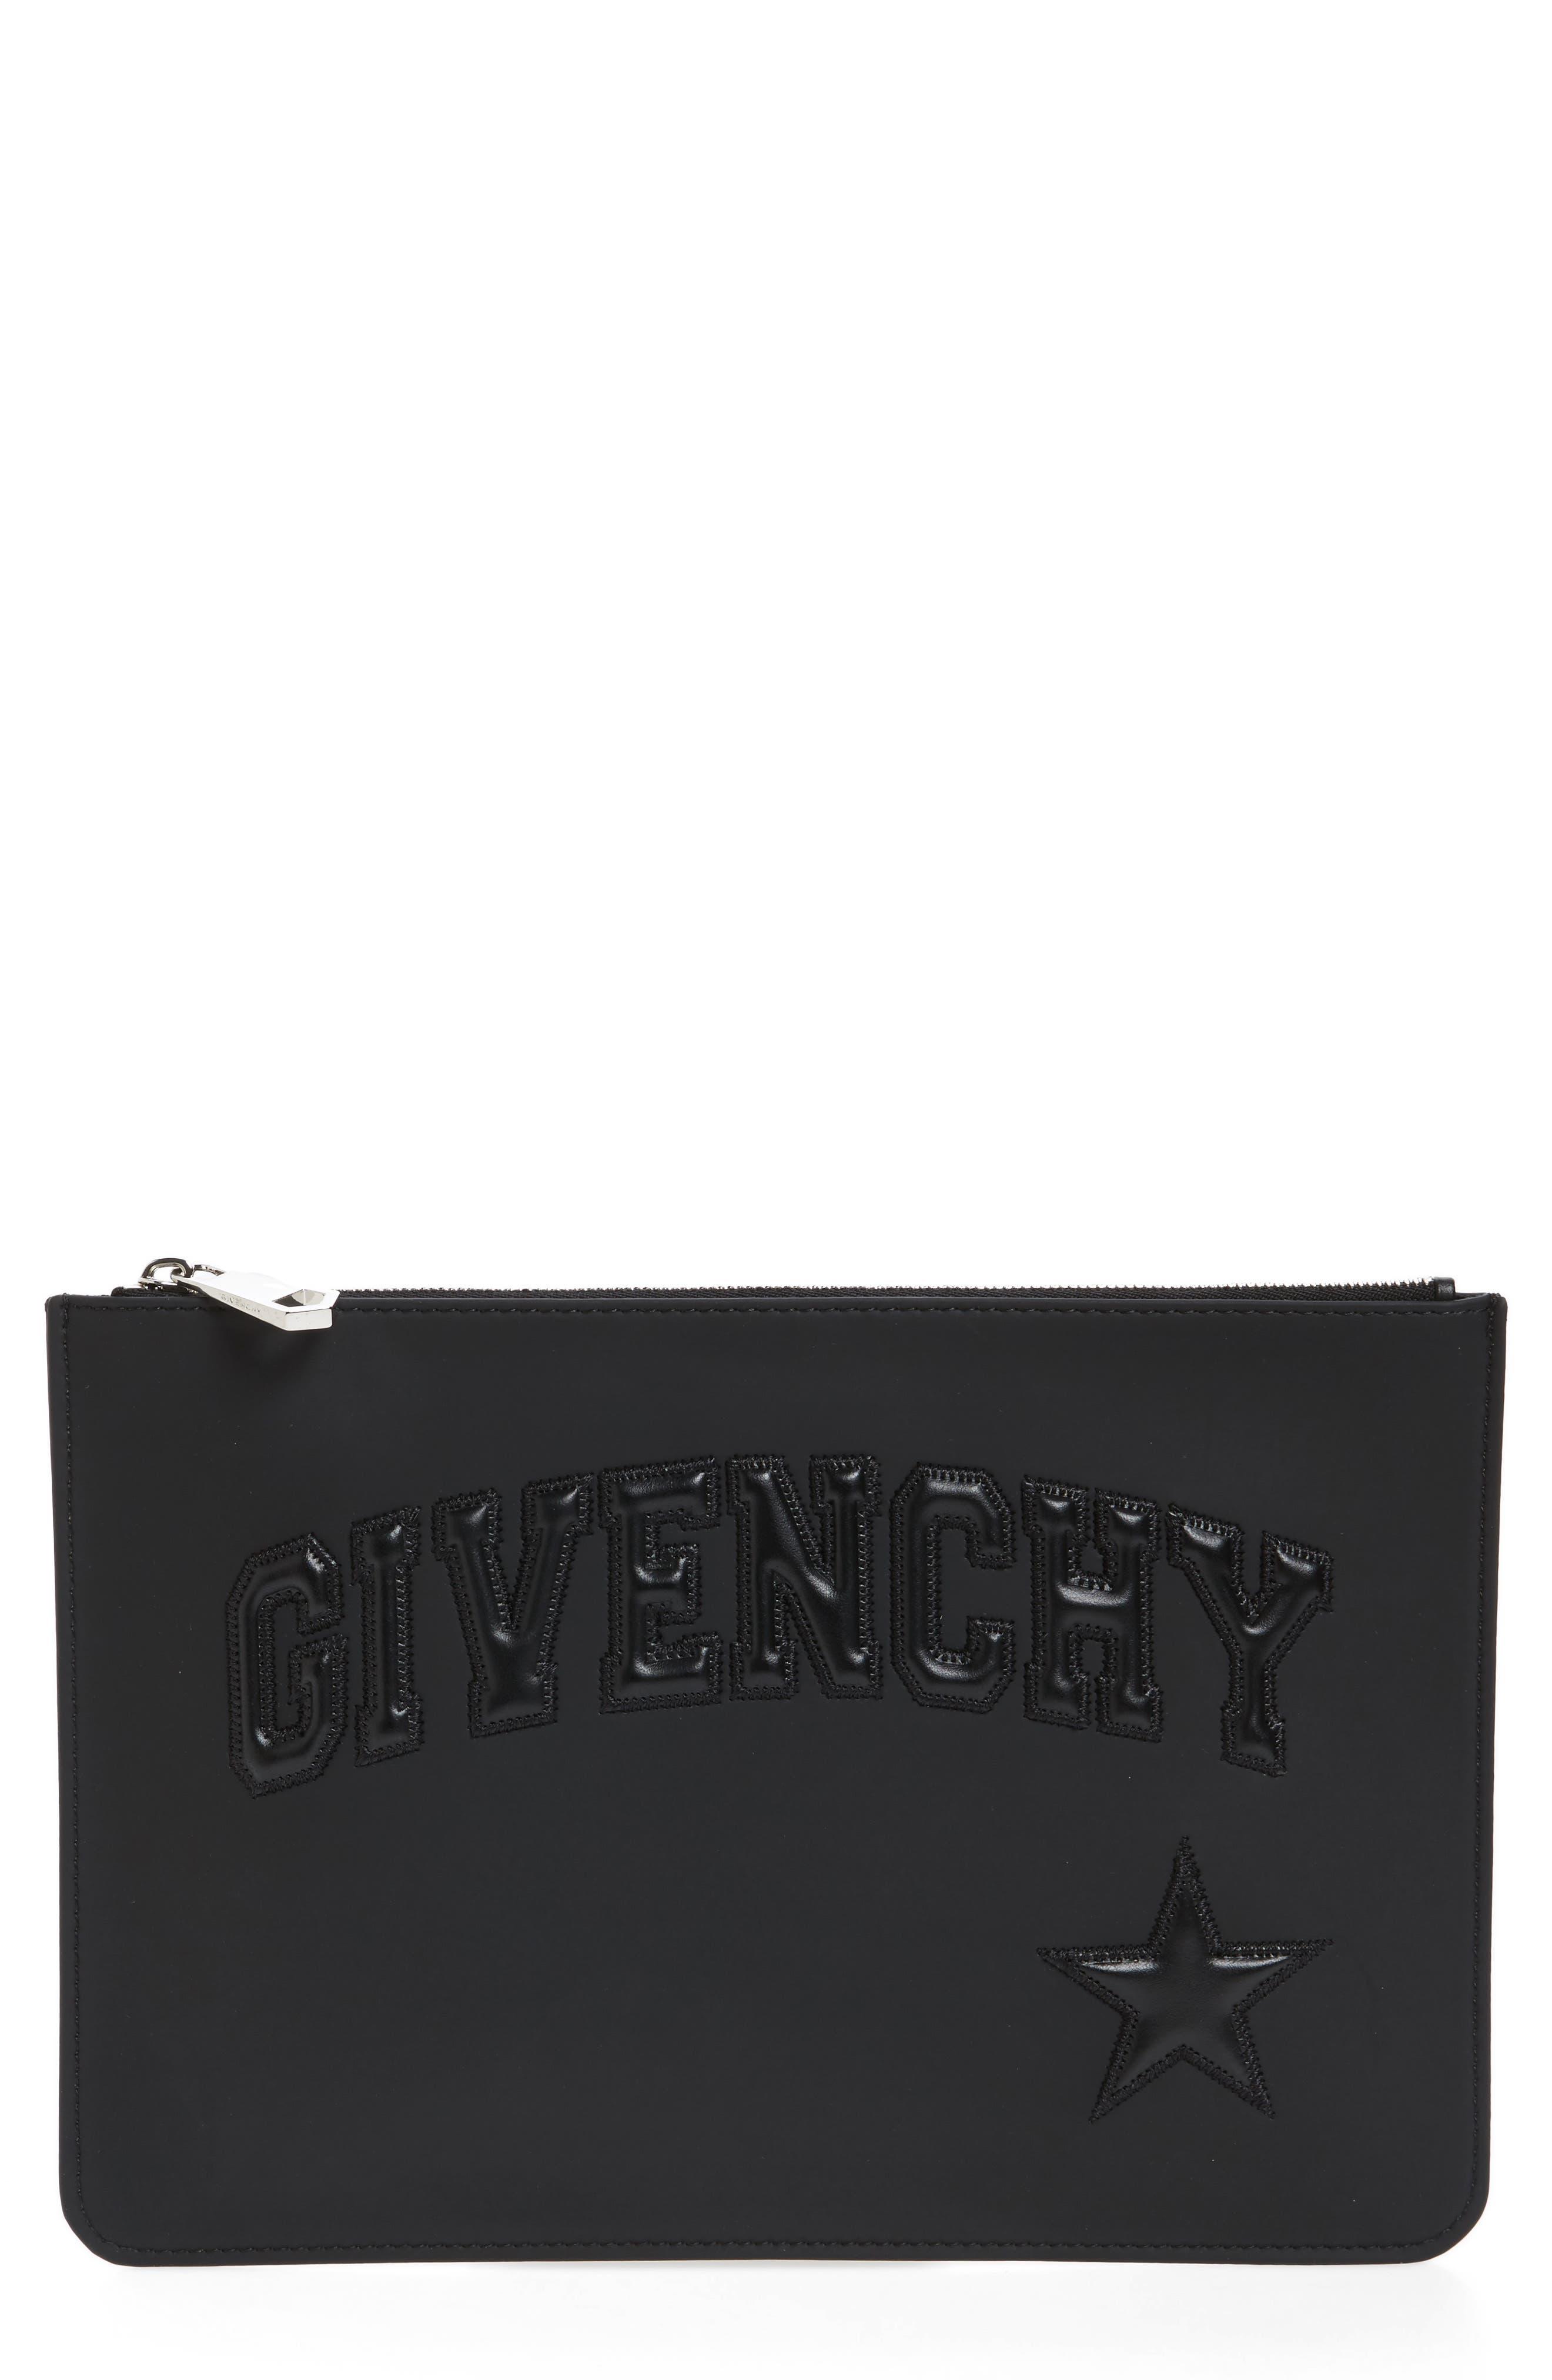 Givenchy Medium Star Logo Pouch